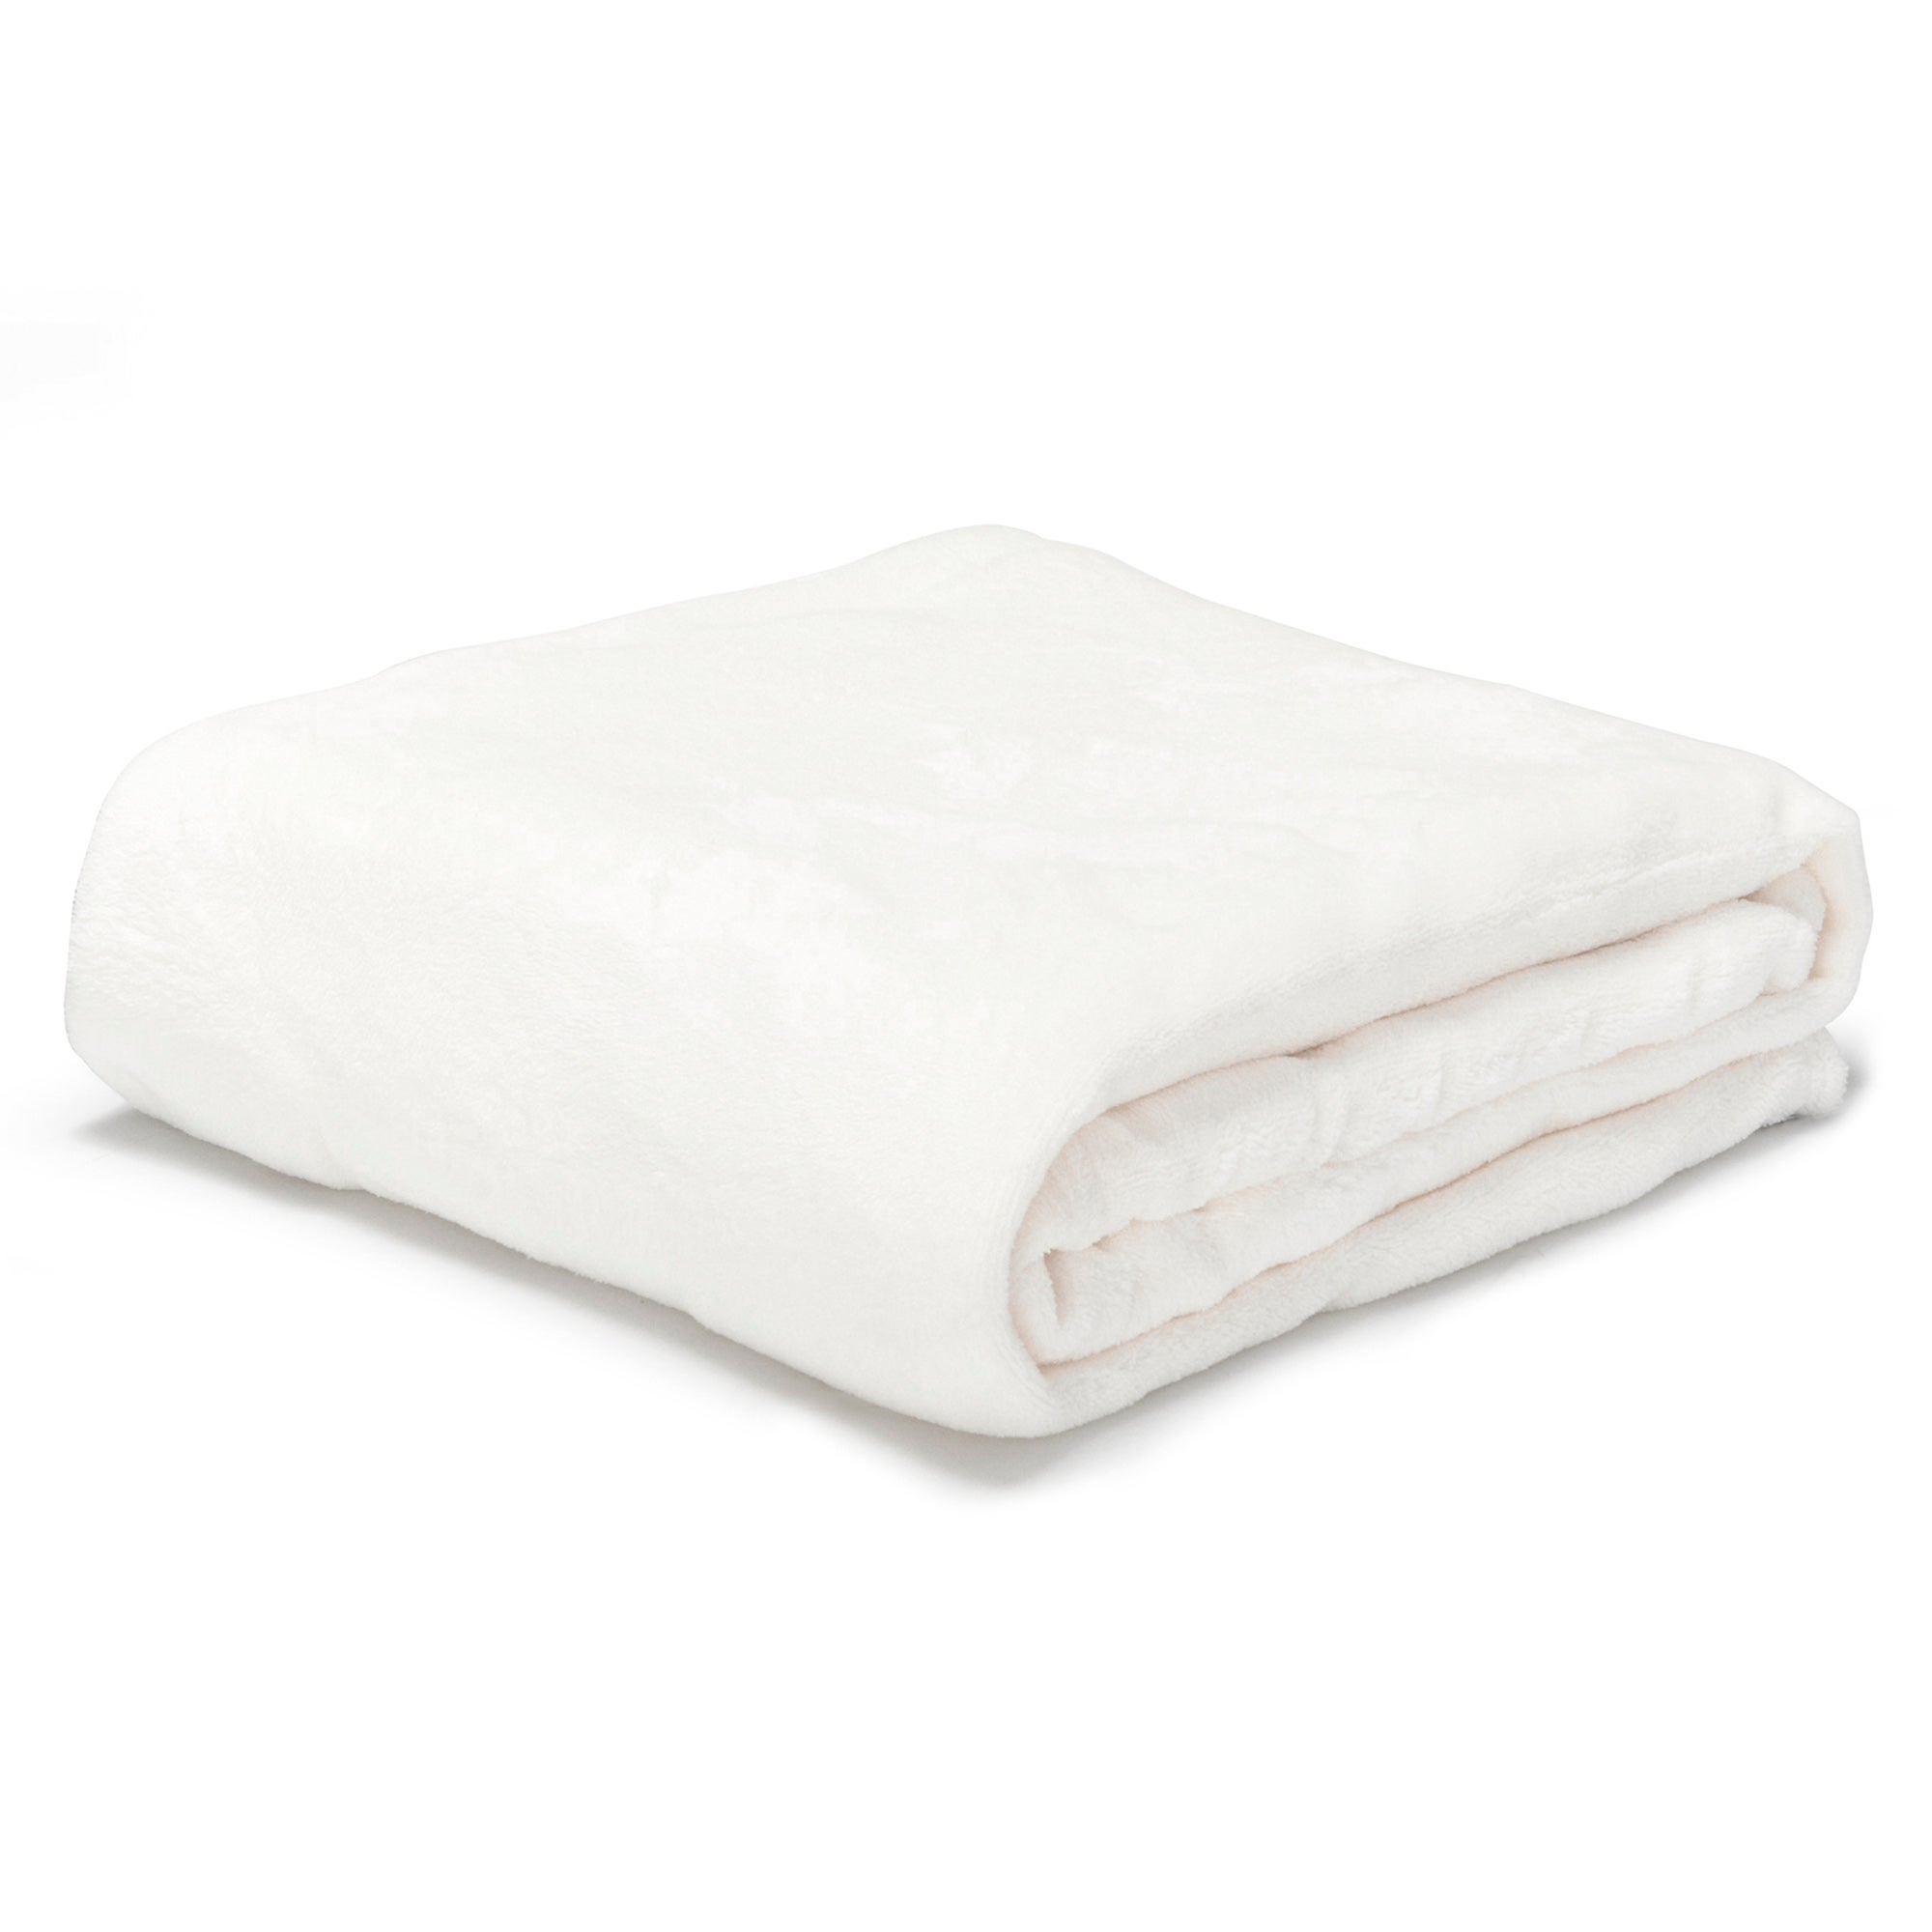 Plain Coral Fleece Blanket